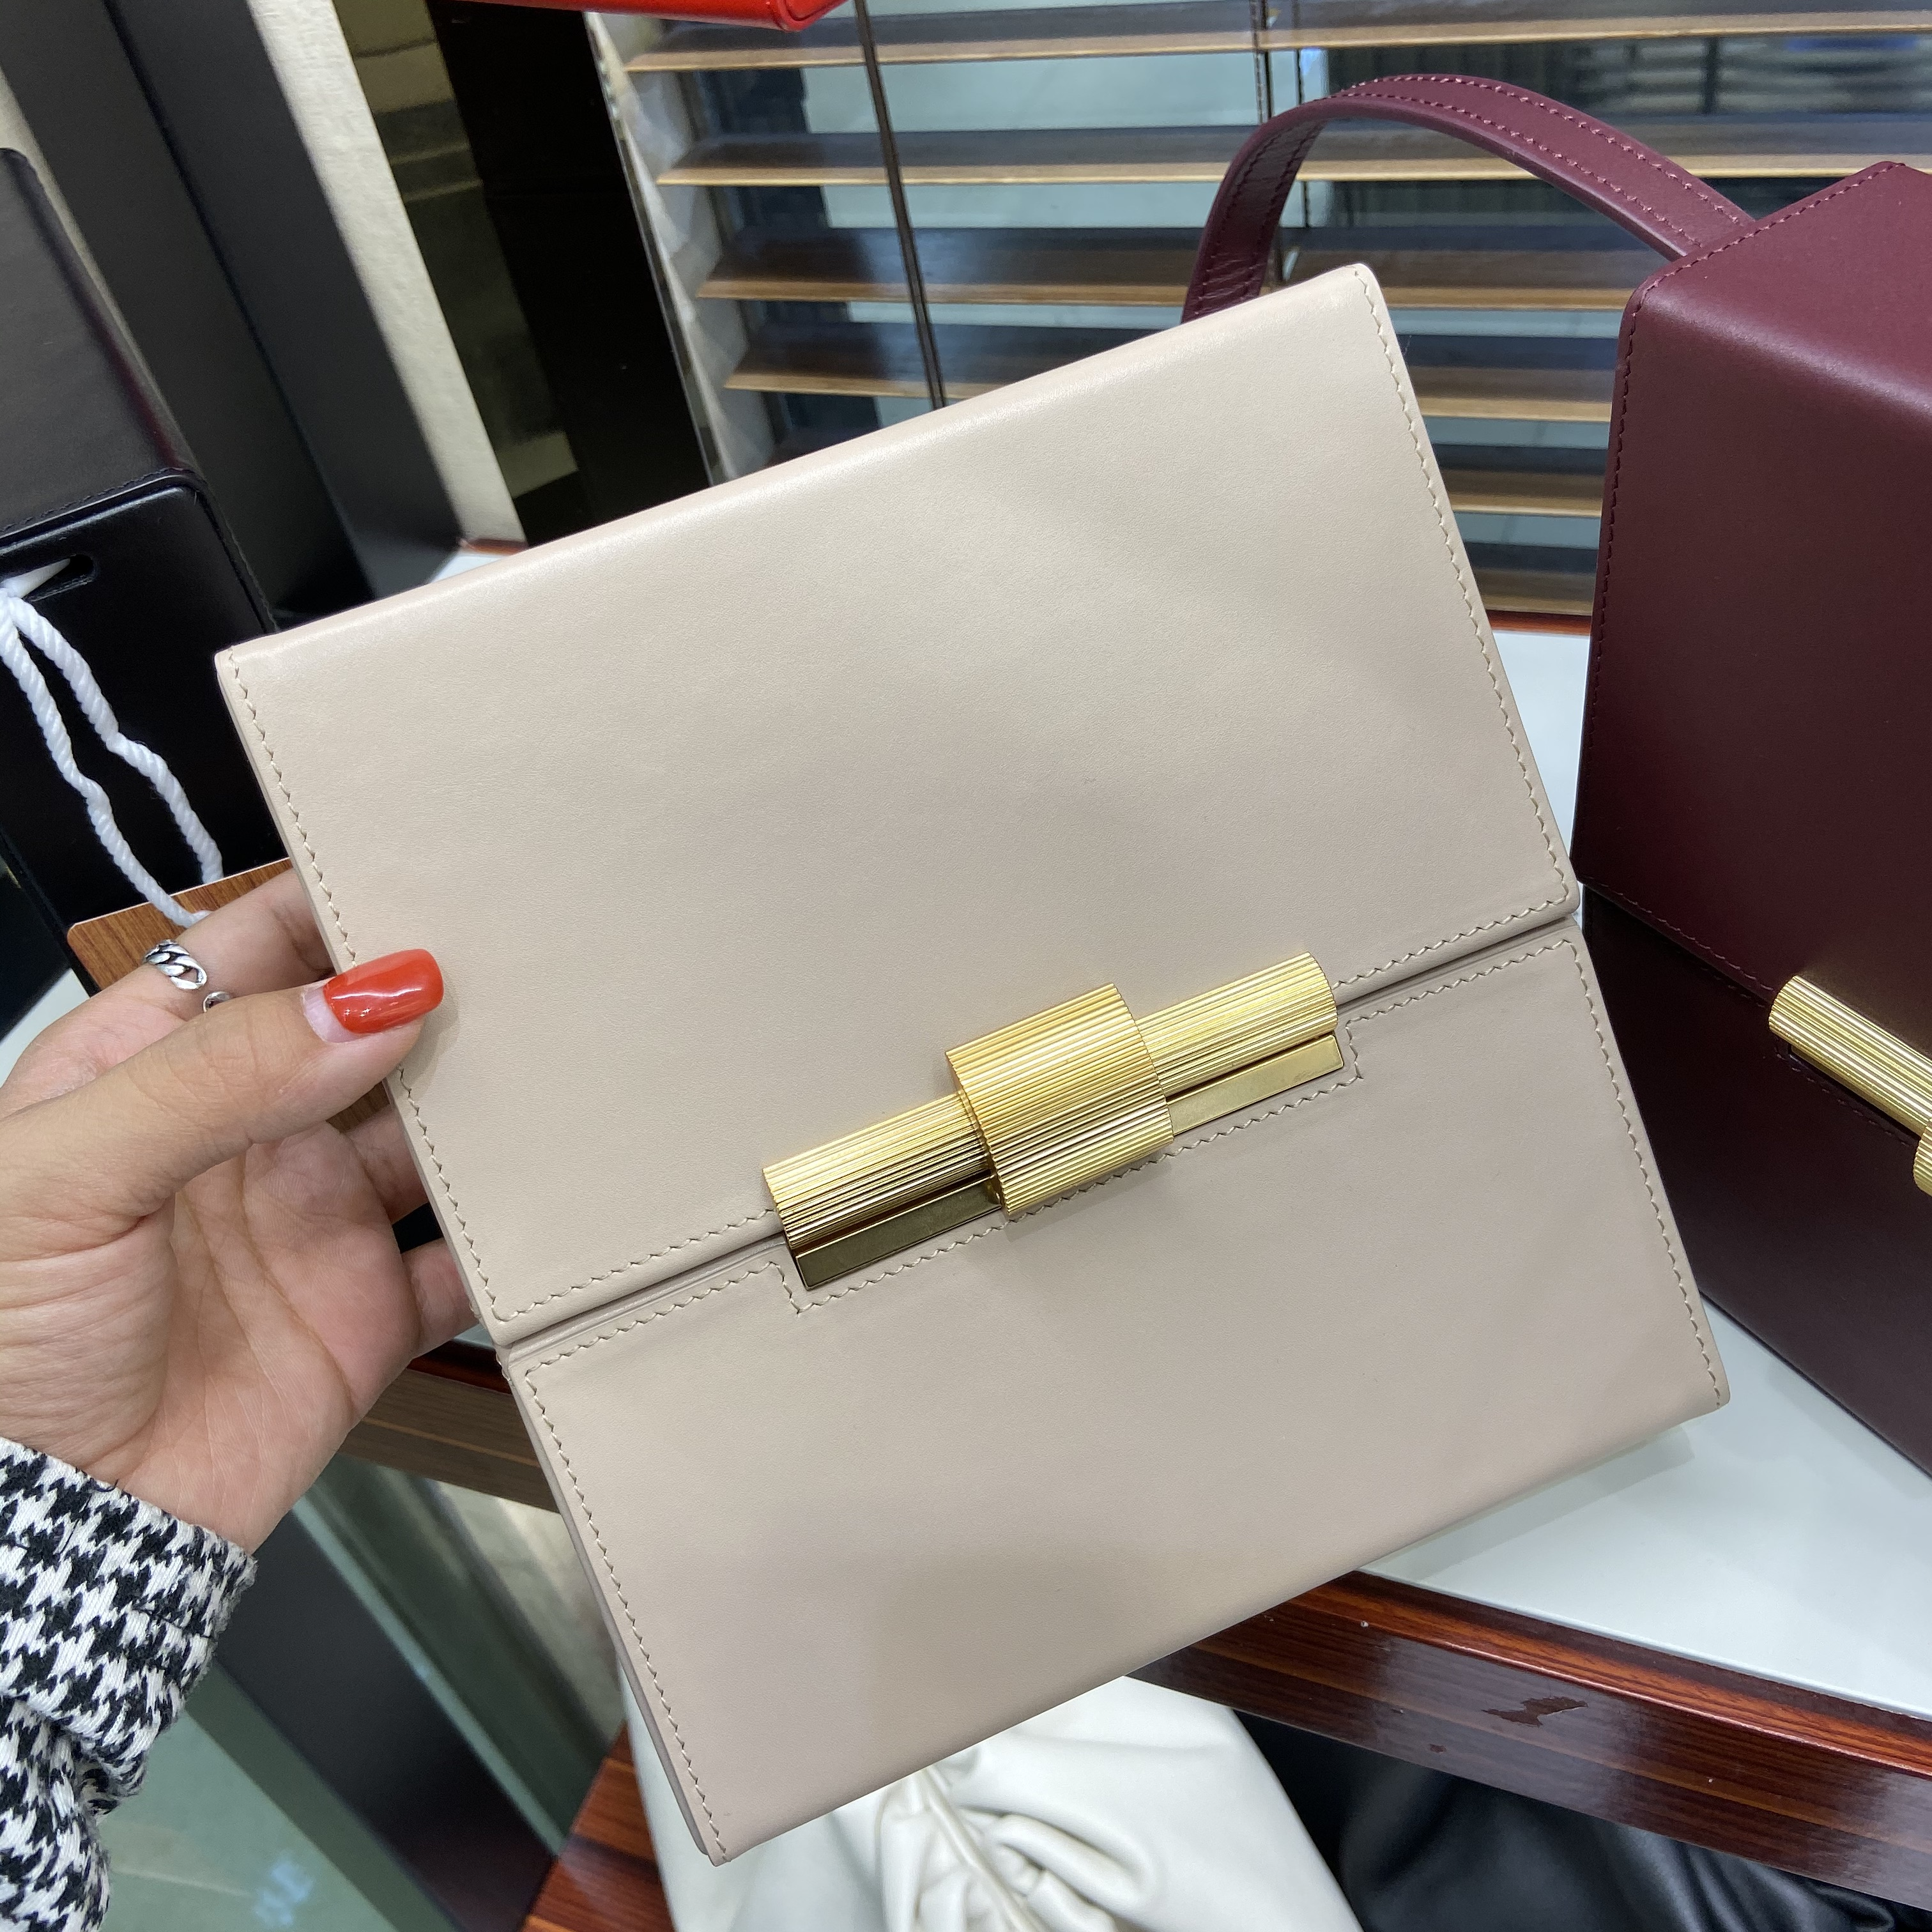 by H November Newest Women's Vintage Box Bag Genuine Leather Small Purse Golden Closure Sqaure Bag Mini Messenger Bag